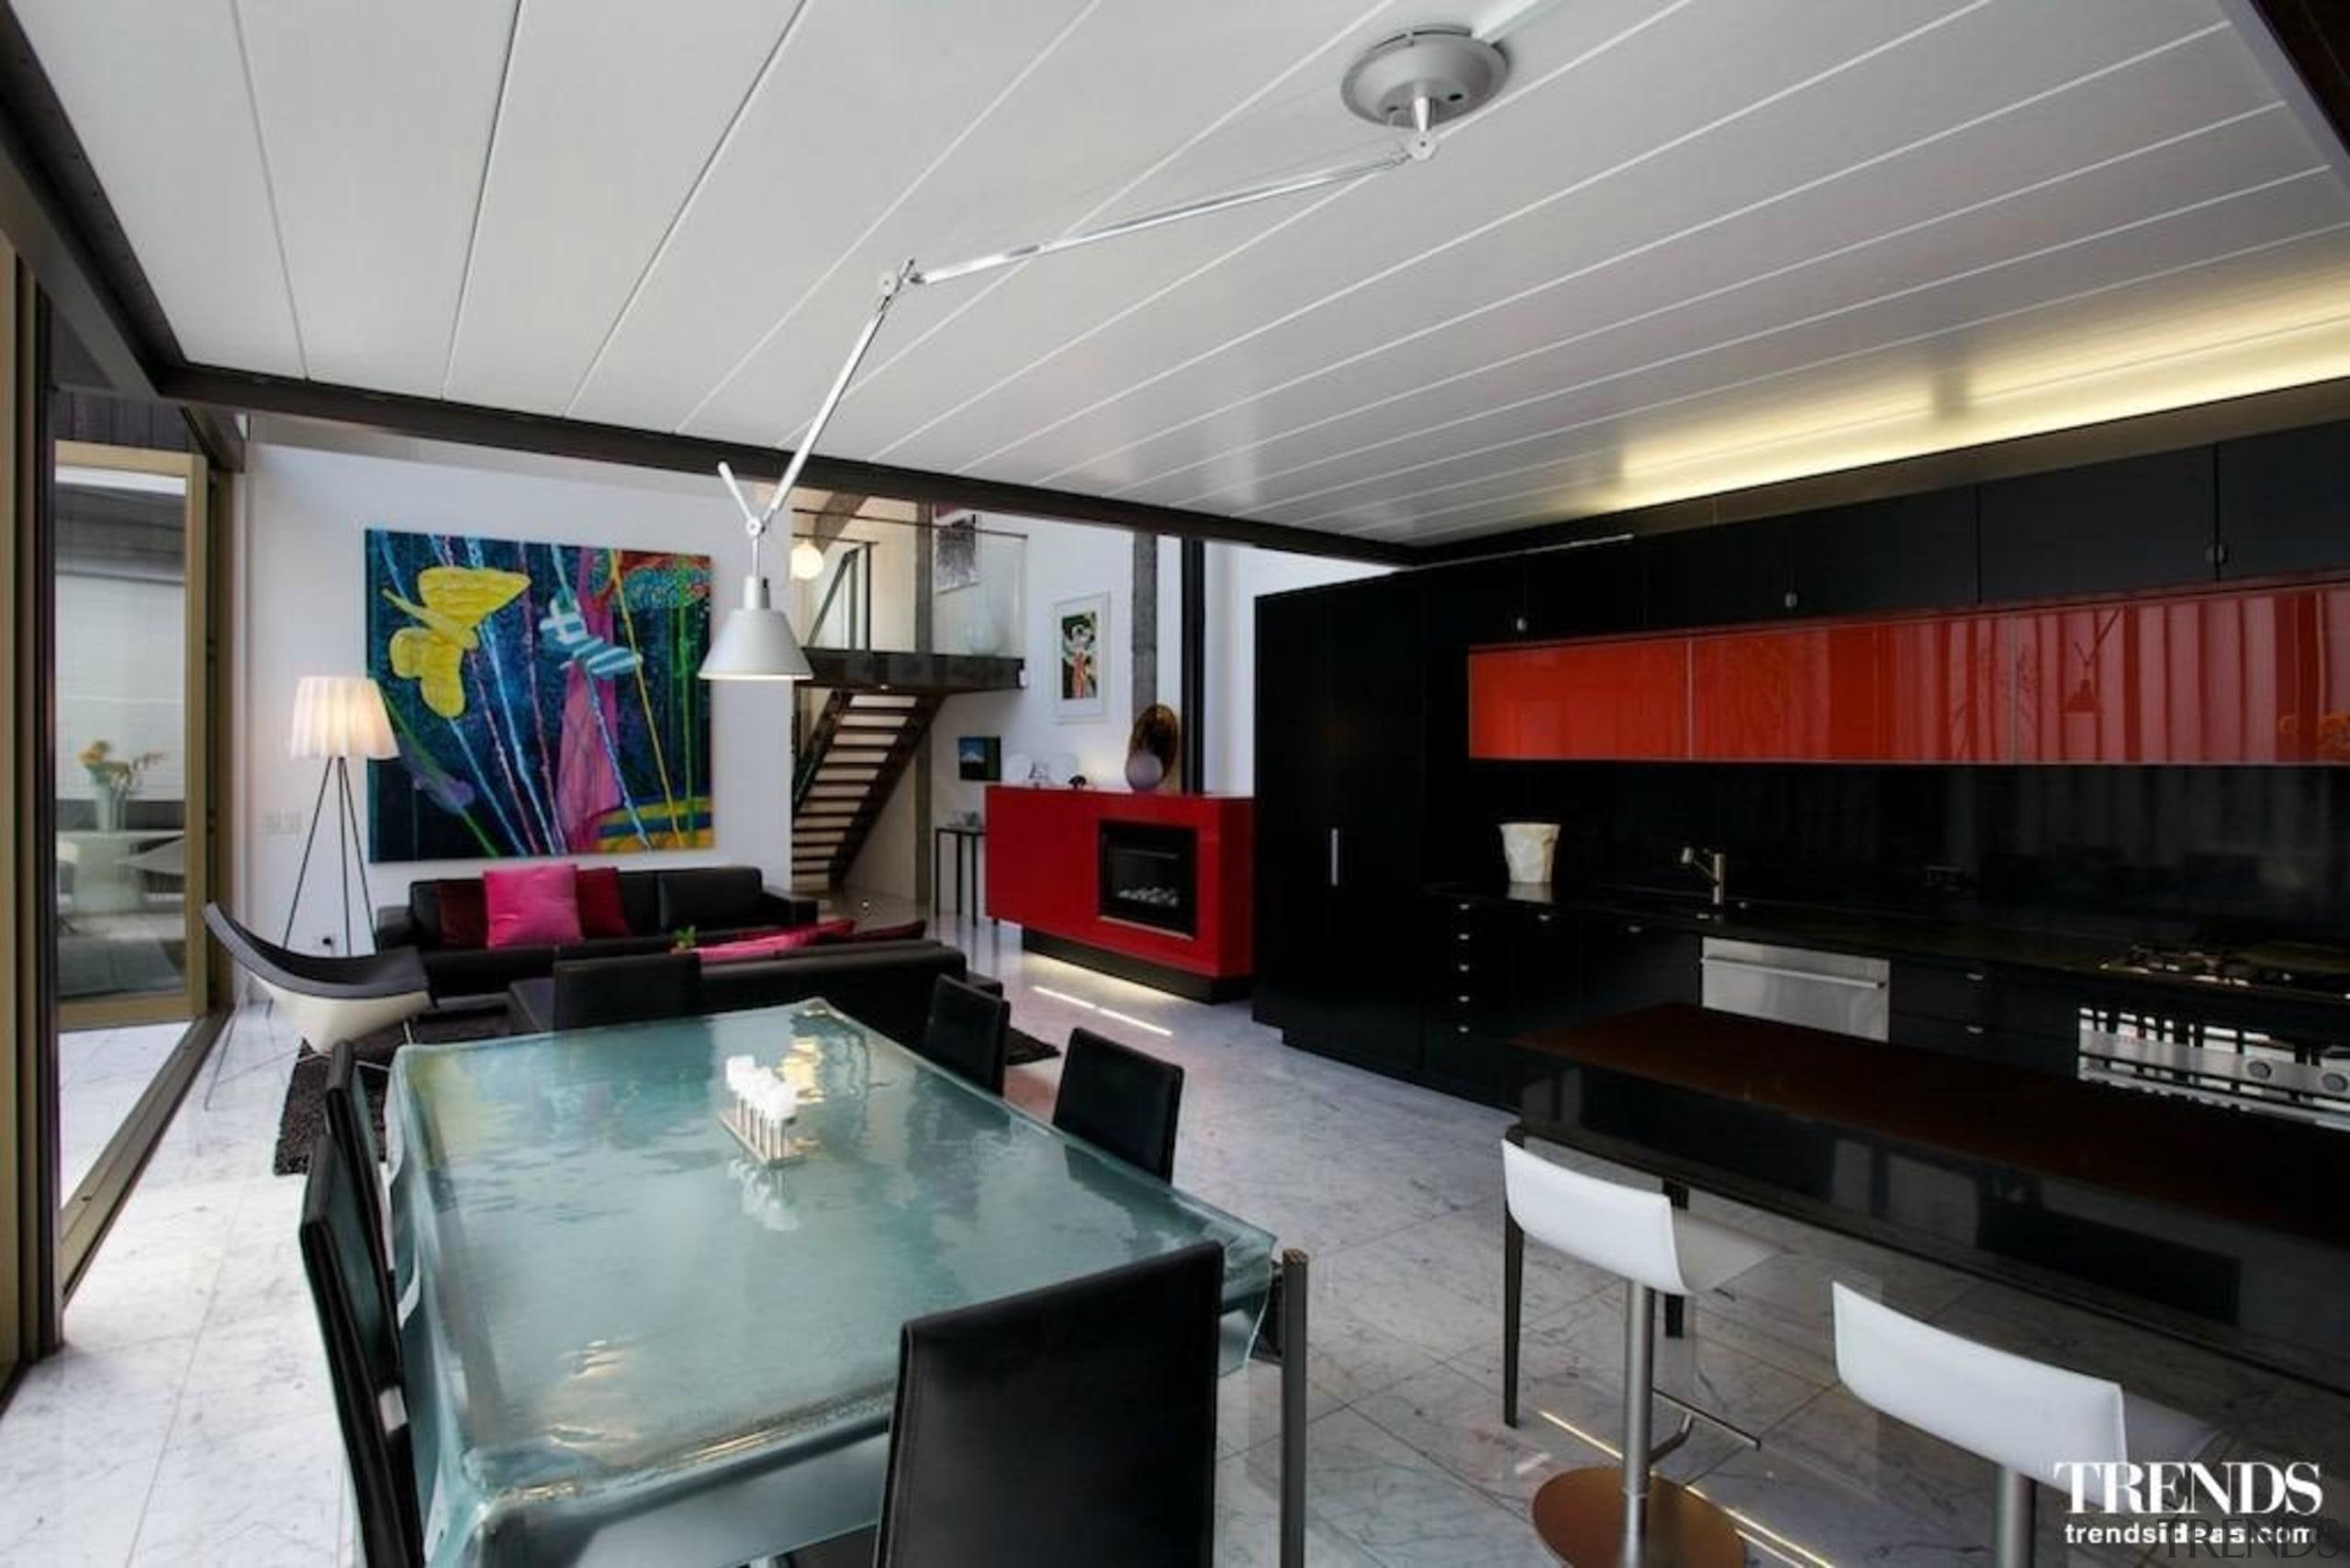 Shortlisted Entry Leuschke Group - interior design | interior design, lobby, loft, property, real estate, gray, black